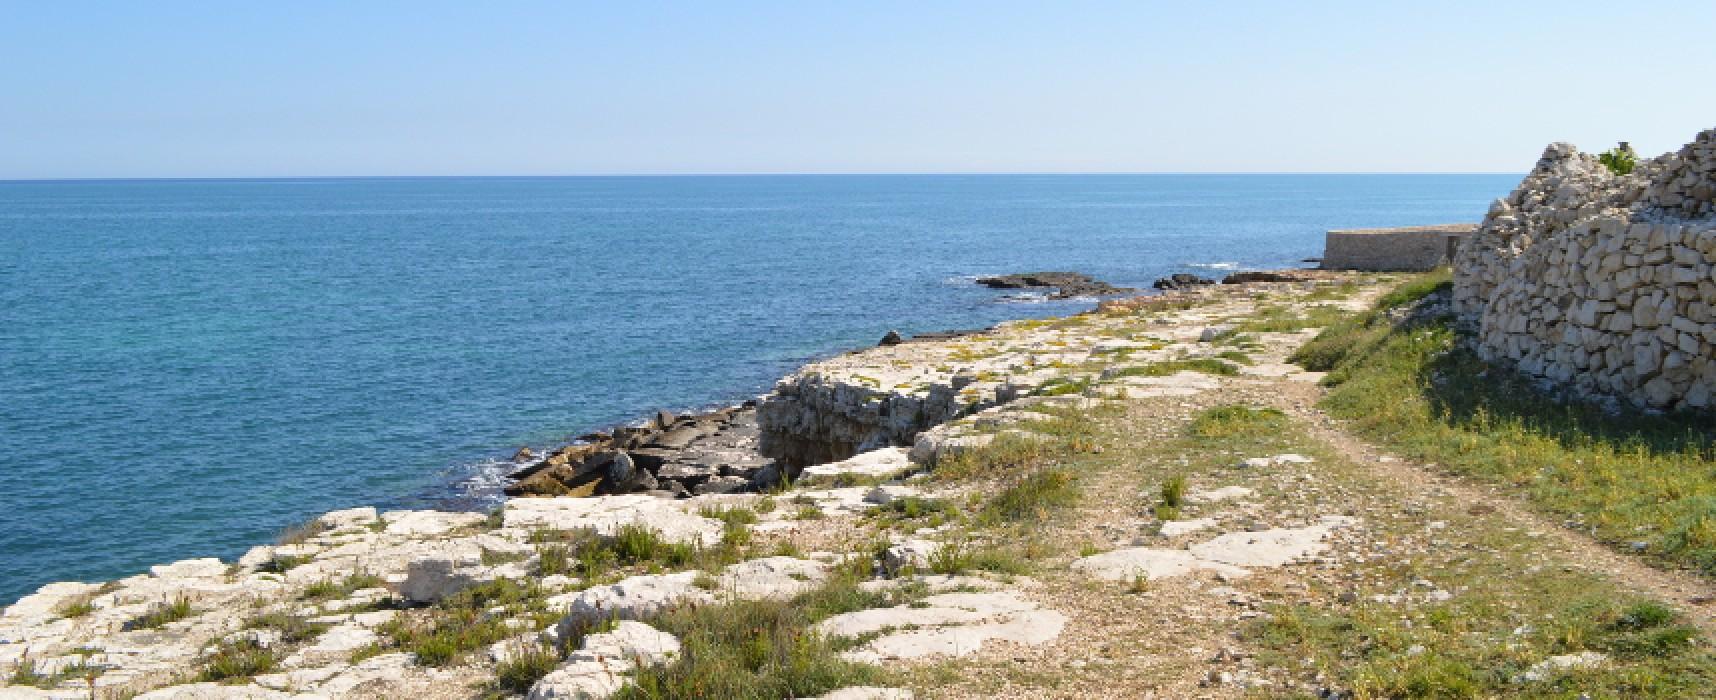 """Piacere, Bisceglie"", amazing seaside, wonderful emotions"